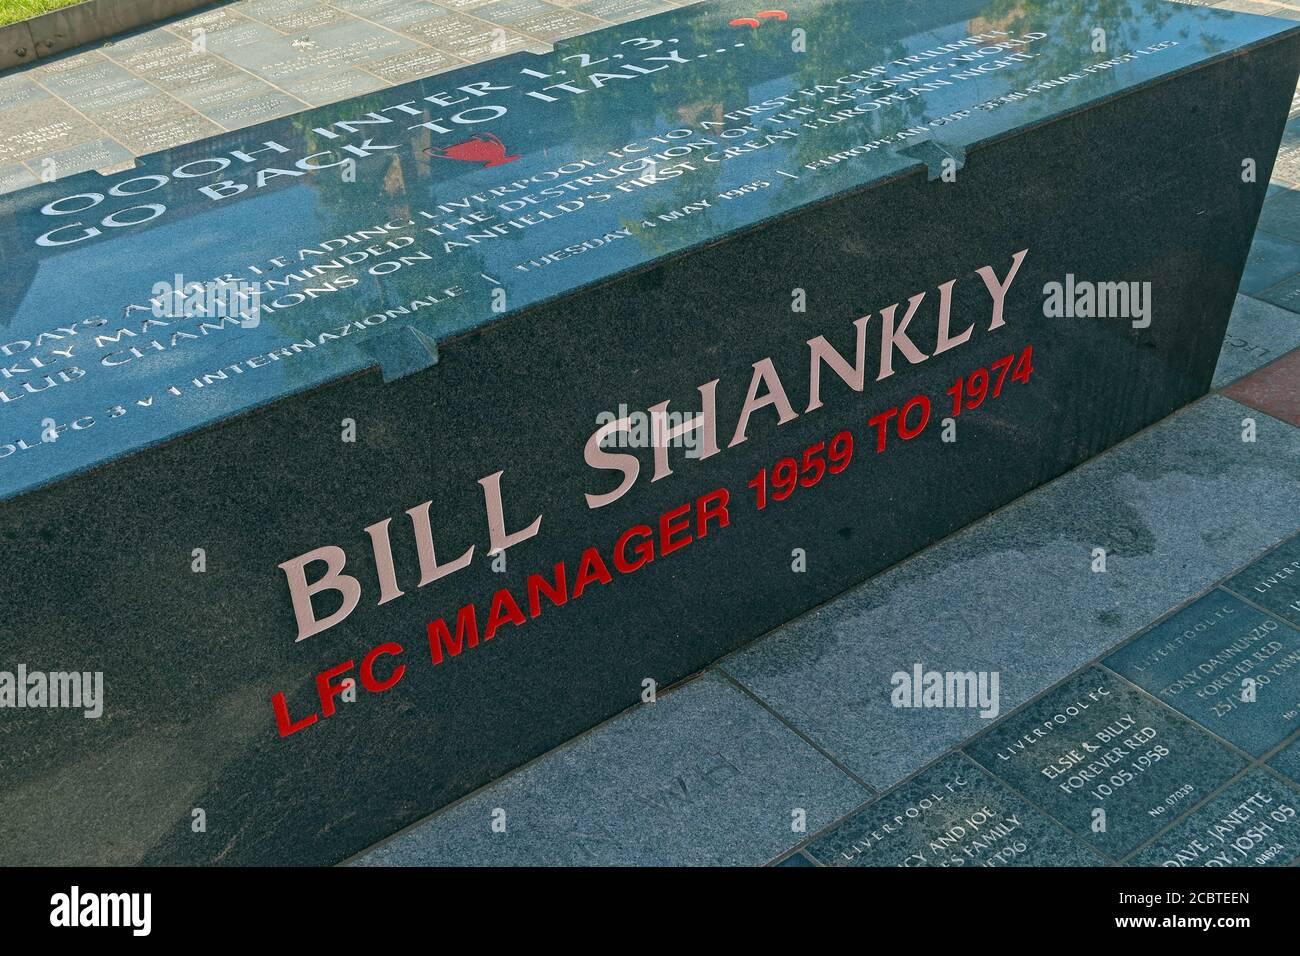 GoTonySmith,HotpixUK,@HotpixUK,England,UK,Britain,Great Britain,Liverpool,city centre,Merseyside,L4,Ground,Stadia,Stadium,Youll Never walk alone,Never Walk alone,reds,the reds,football,Premier League,William Shankly,OBE,manager,Bill